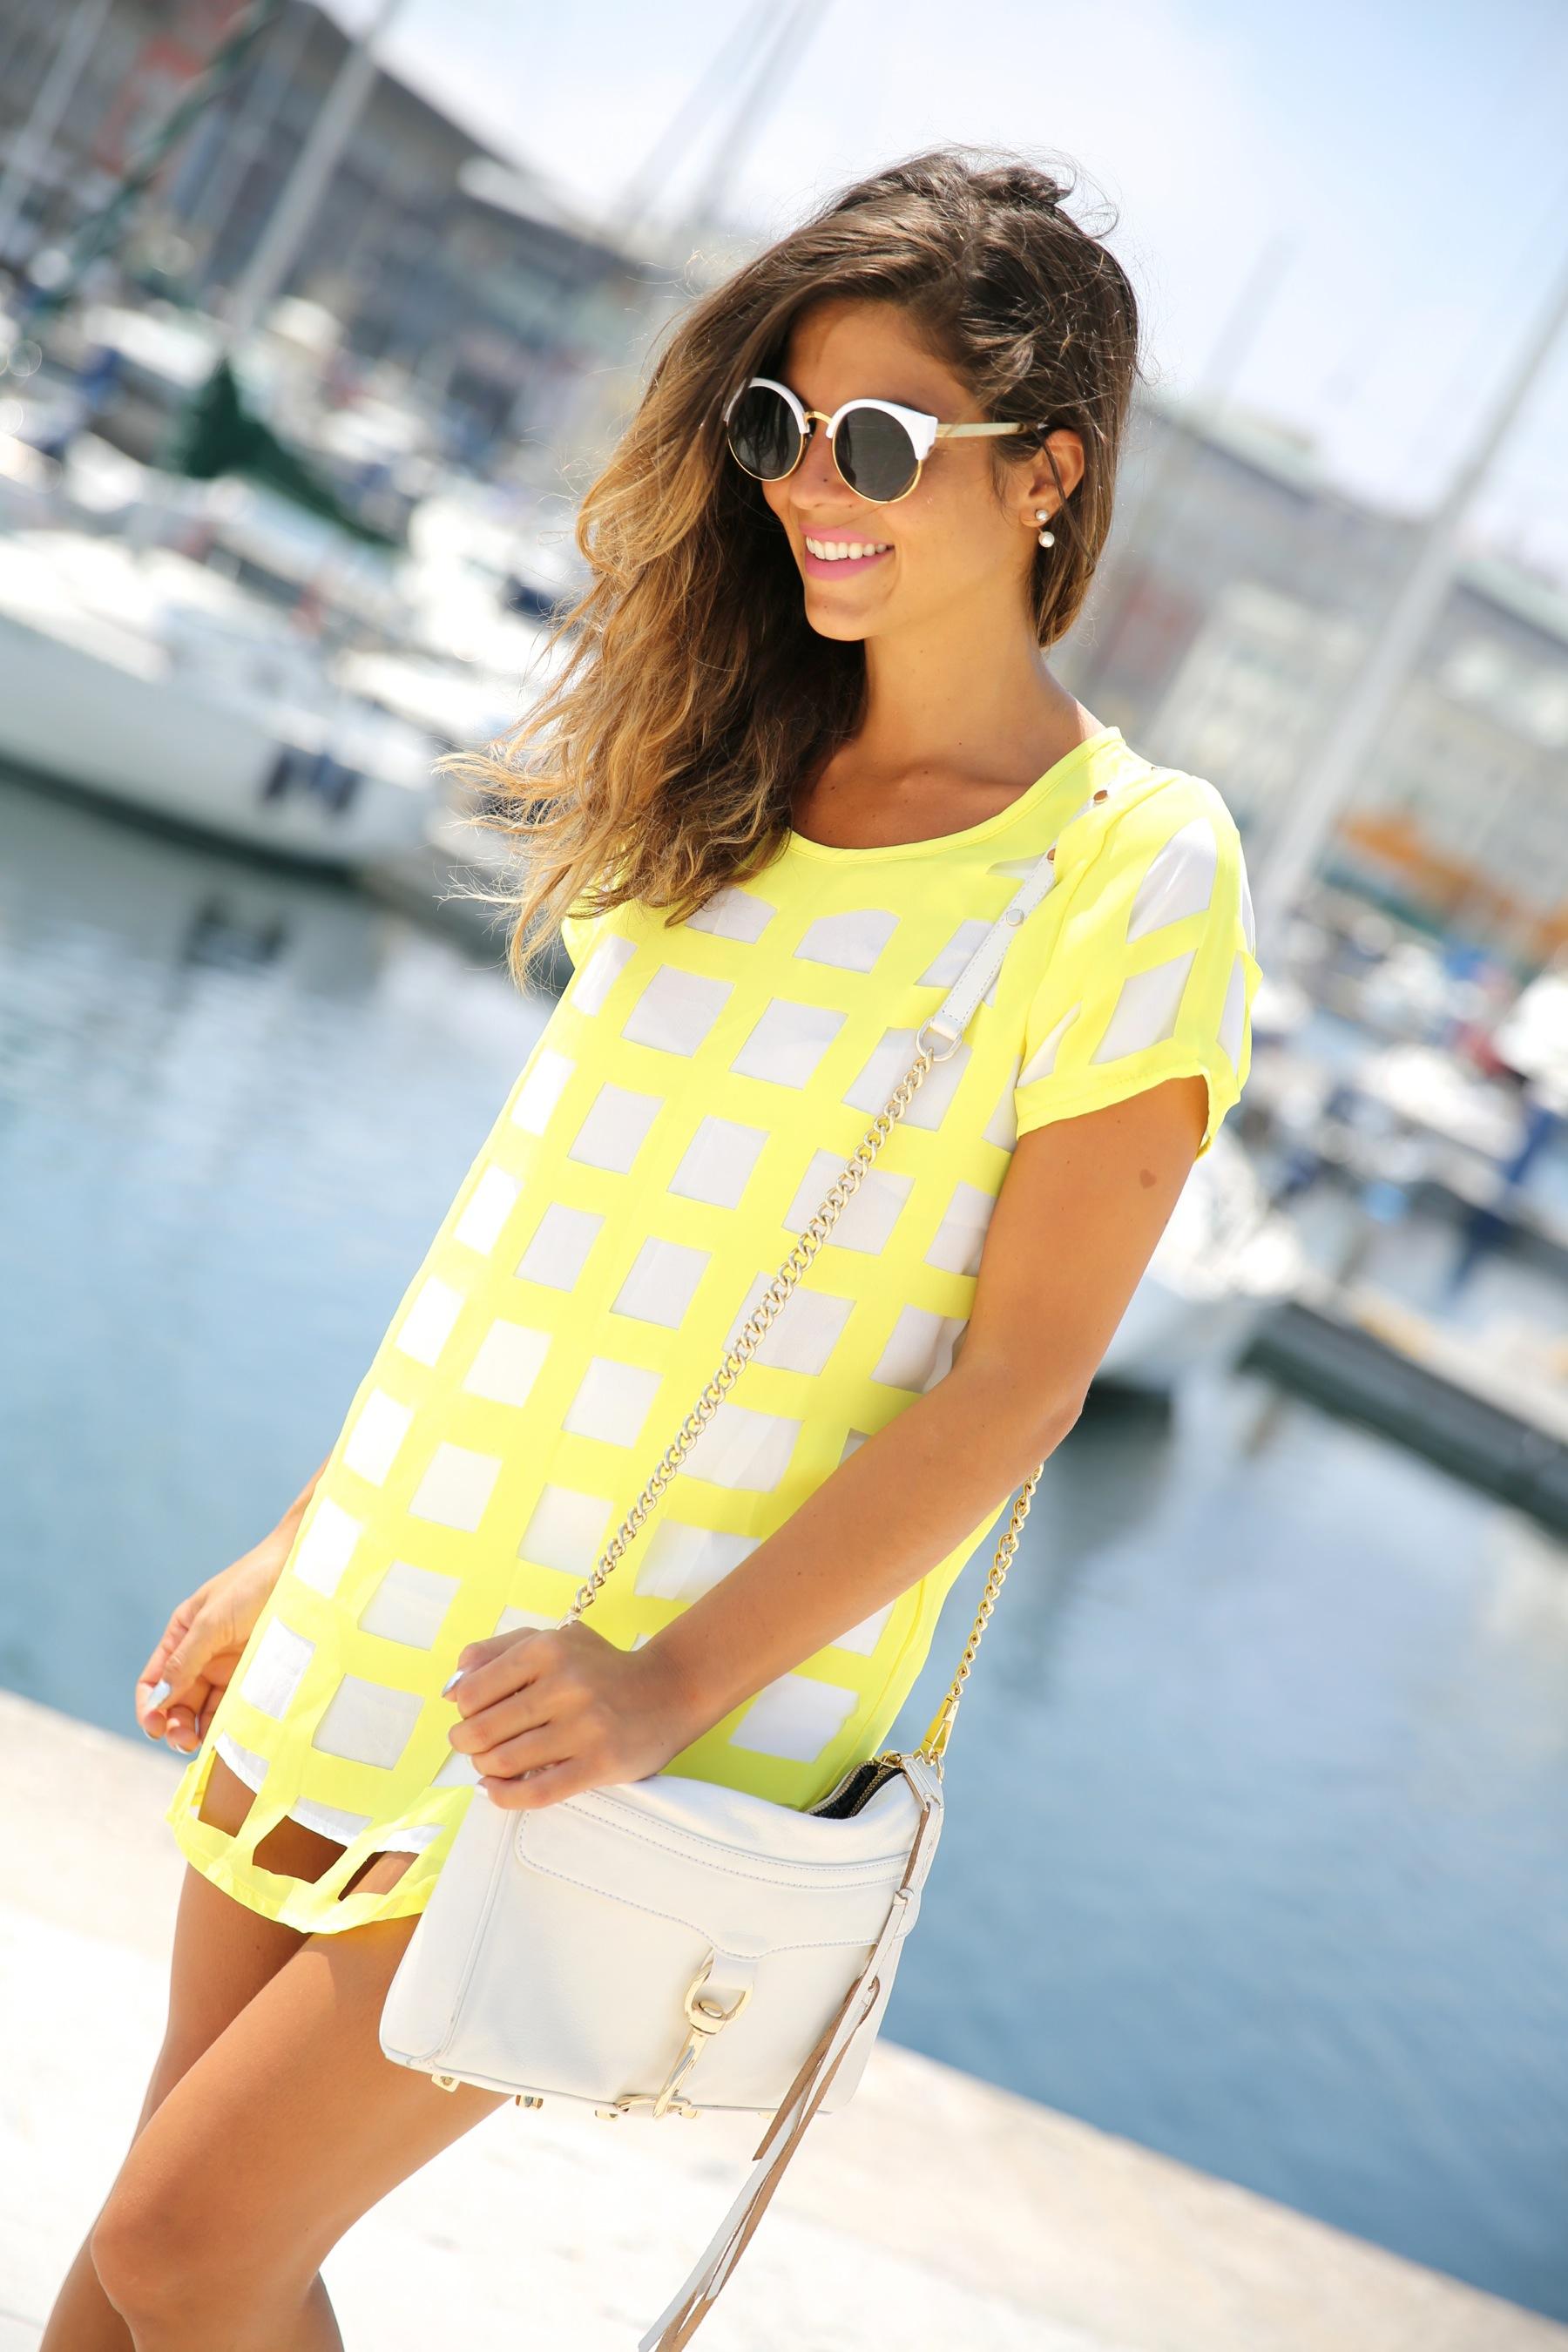 trendy_taste-look-outfit-street_style-ootd-blog-blogger-moda_españa-fashion_spain-coruña-galicia-sandalias_plataforma-platform_sandals-rebecca_minkoff-yellow-amarillo-vestido-dress-plaid-cuadros-4